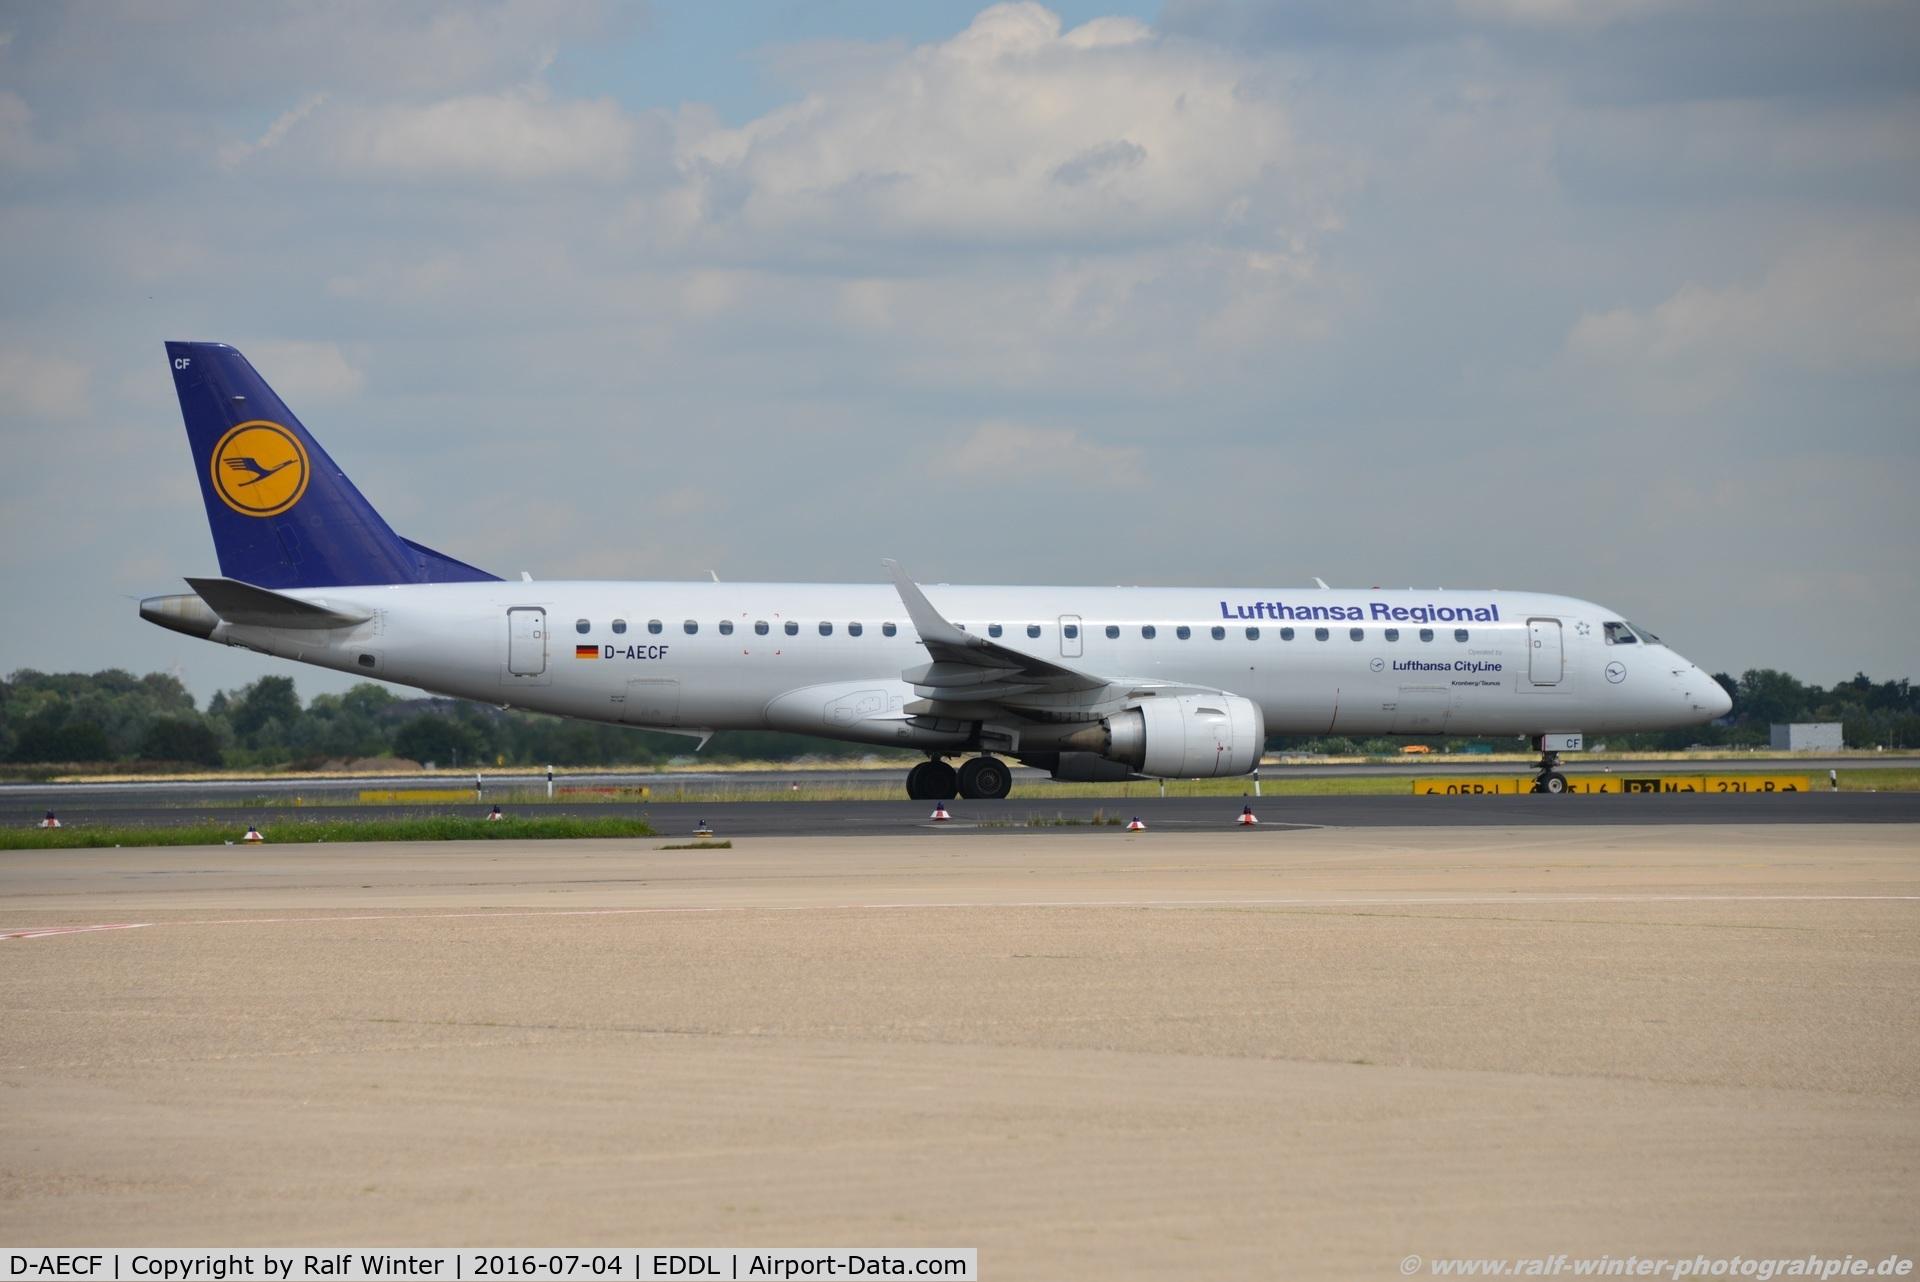 D-AECF, 2010 Embraer 190LR (ERJ-190-100LR) C/N 19000359, Embraer ERJ-190AR - CL CLH Lufthansa Cityline 'Kronberg/Taunus' - 19000359 - D-AECF - 04.07.2016 - DUS